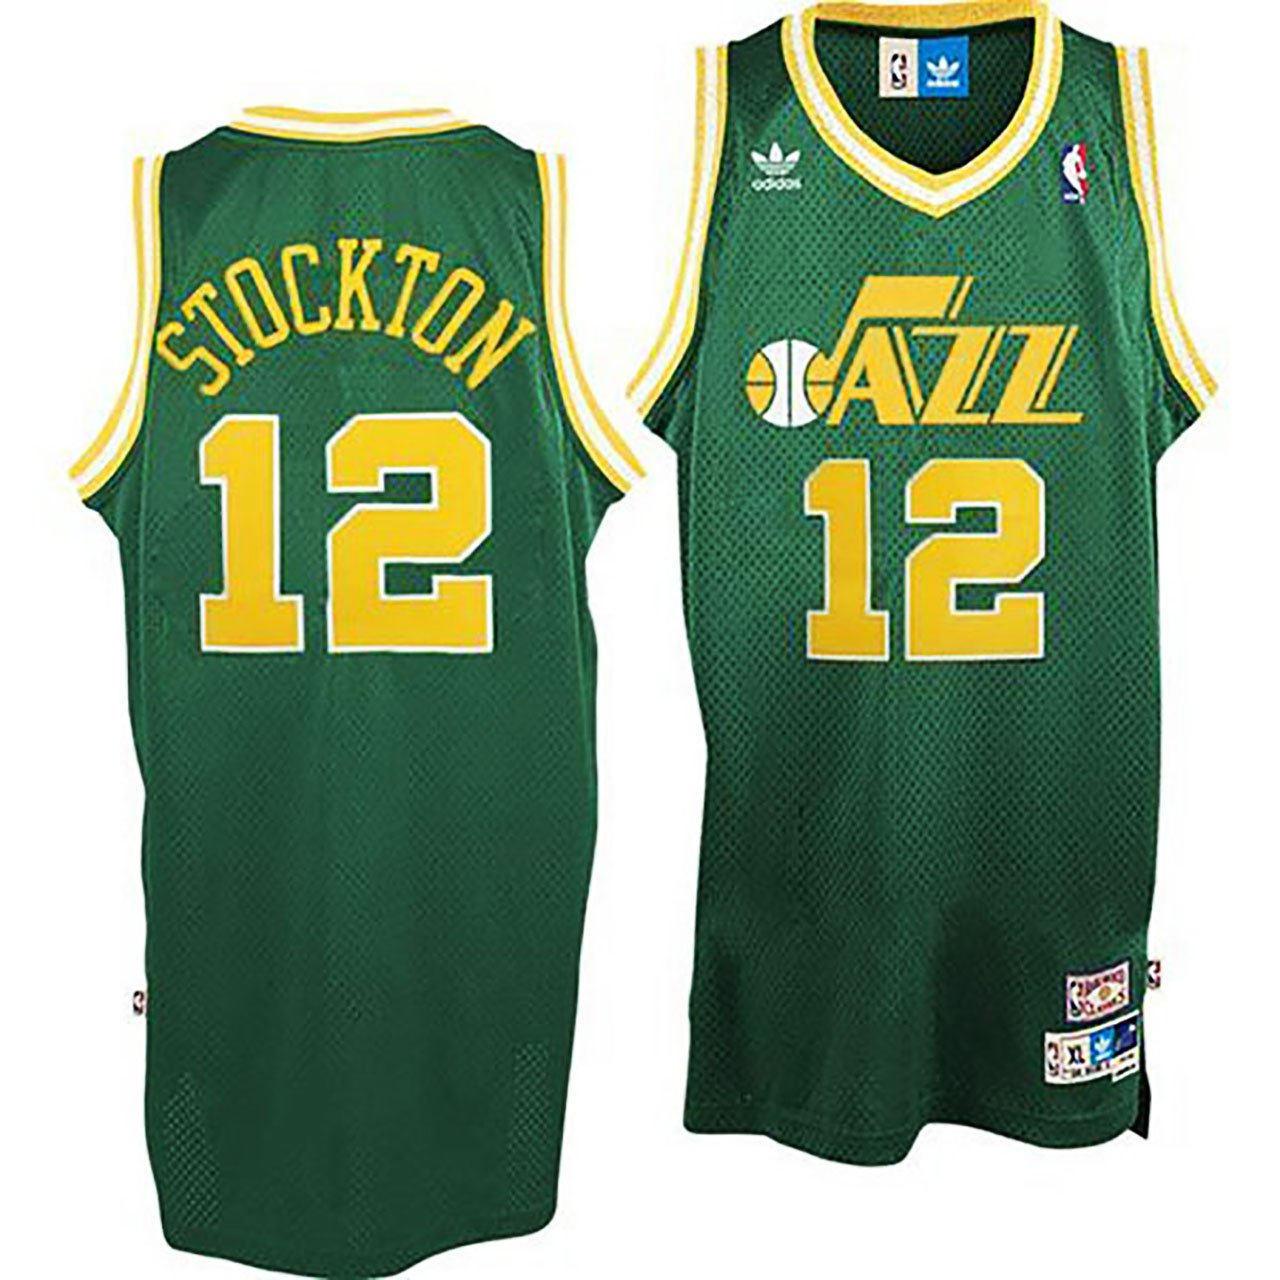 John Stockton Utah Jazz #12 Hardwood Classics Stitched Jerse